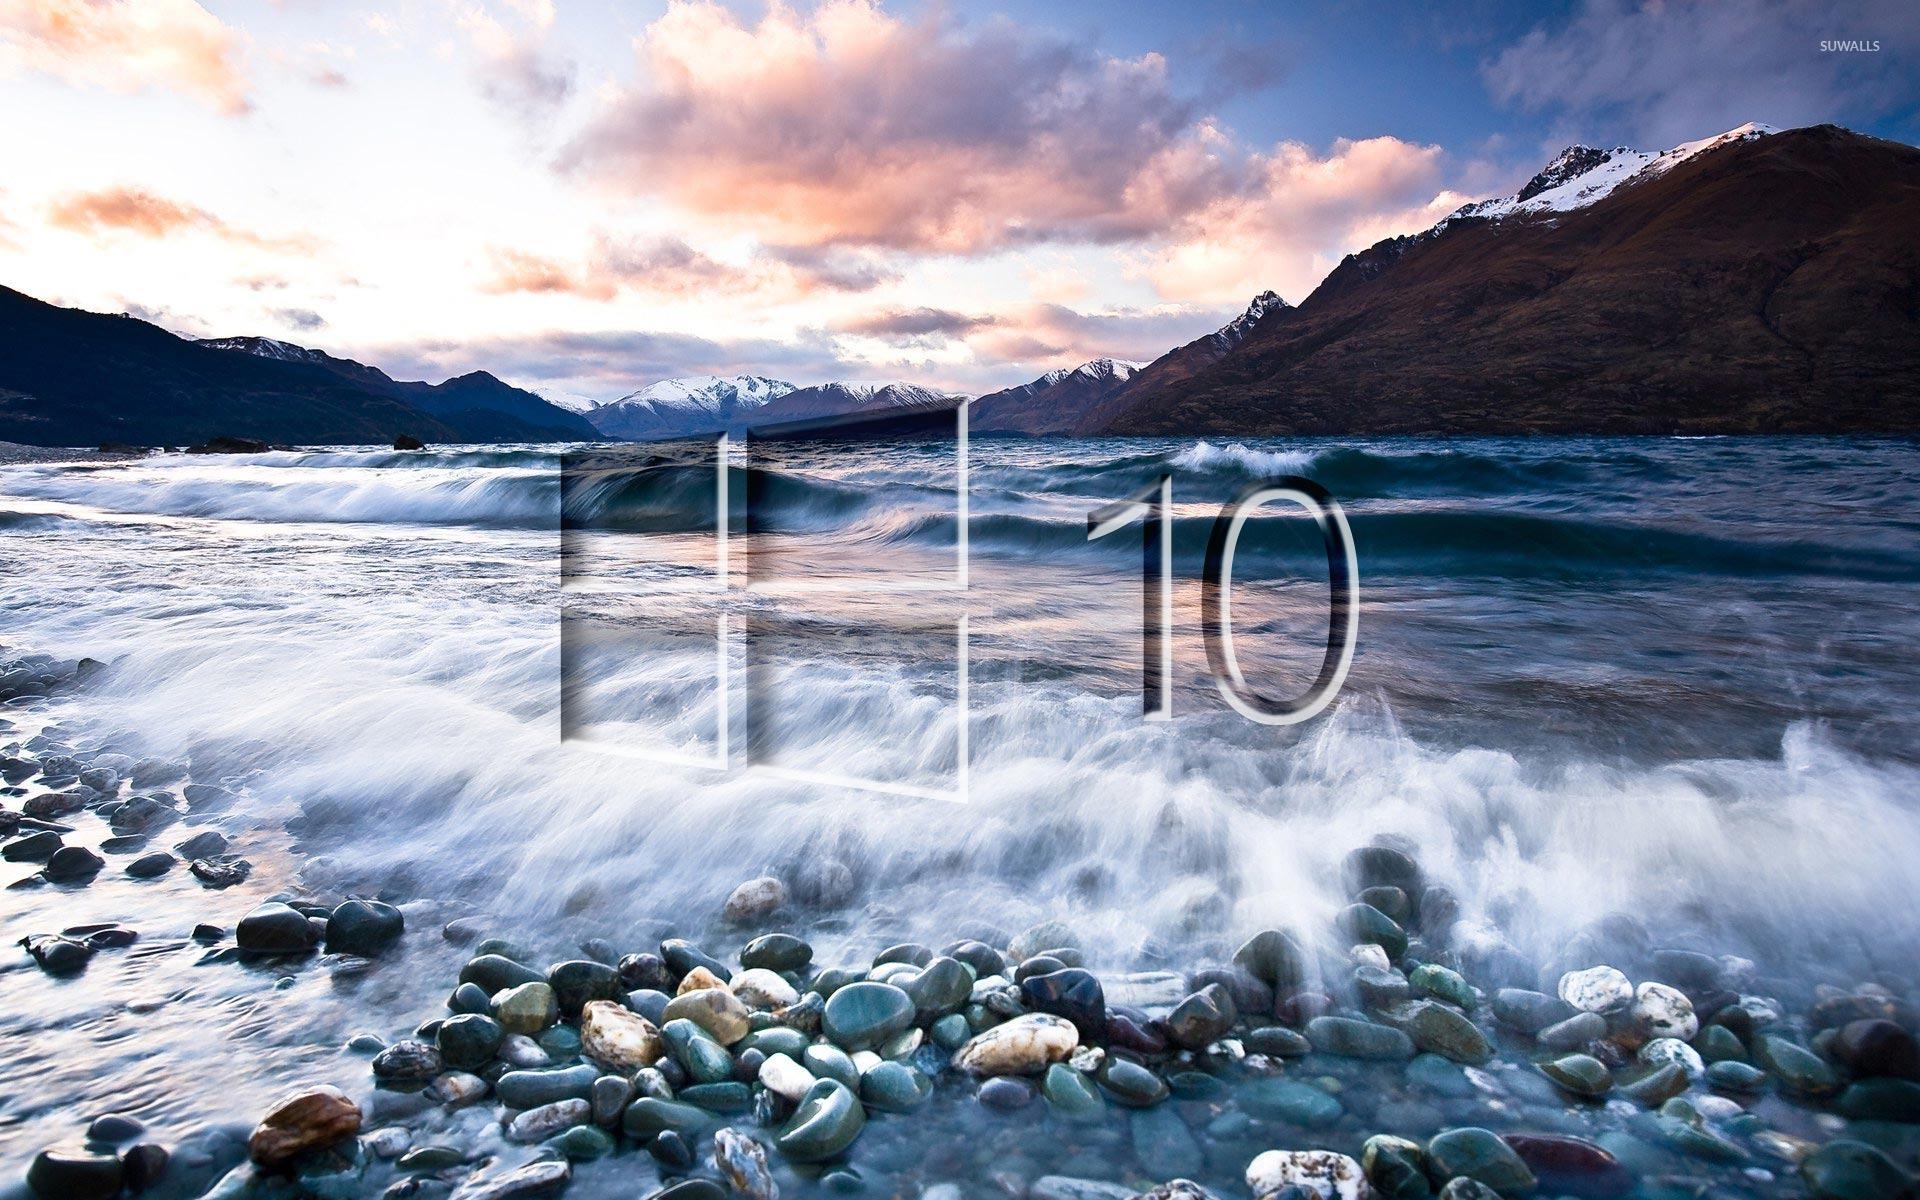 Best Wallpaper Mountain Windows 10 - windows-10-on-the-lake-shore-47074-1920x1200  Best Photo Reference_234124.jpg